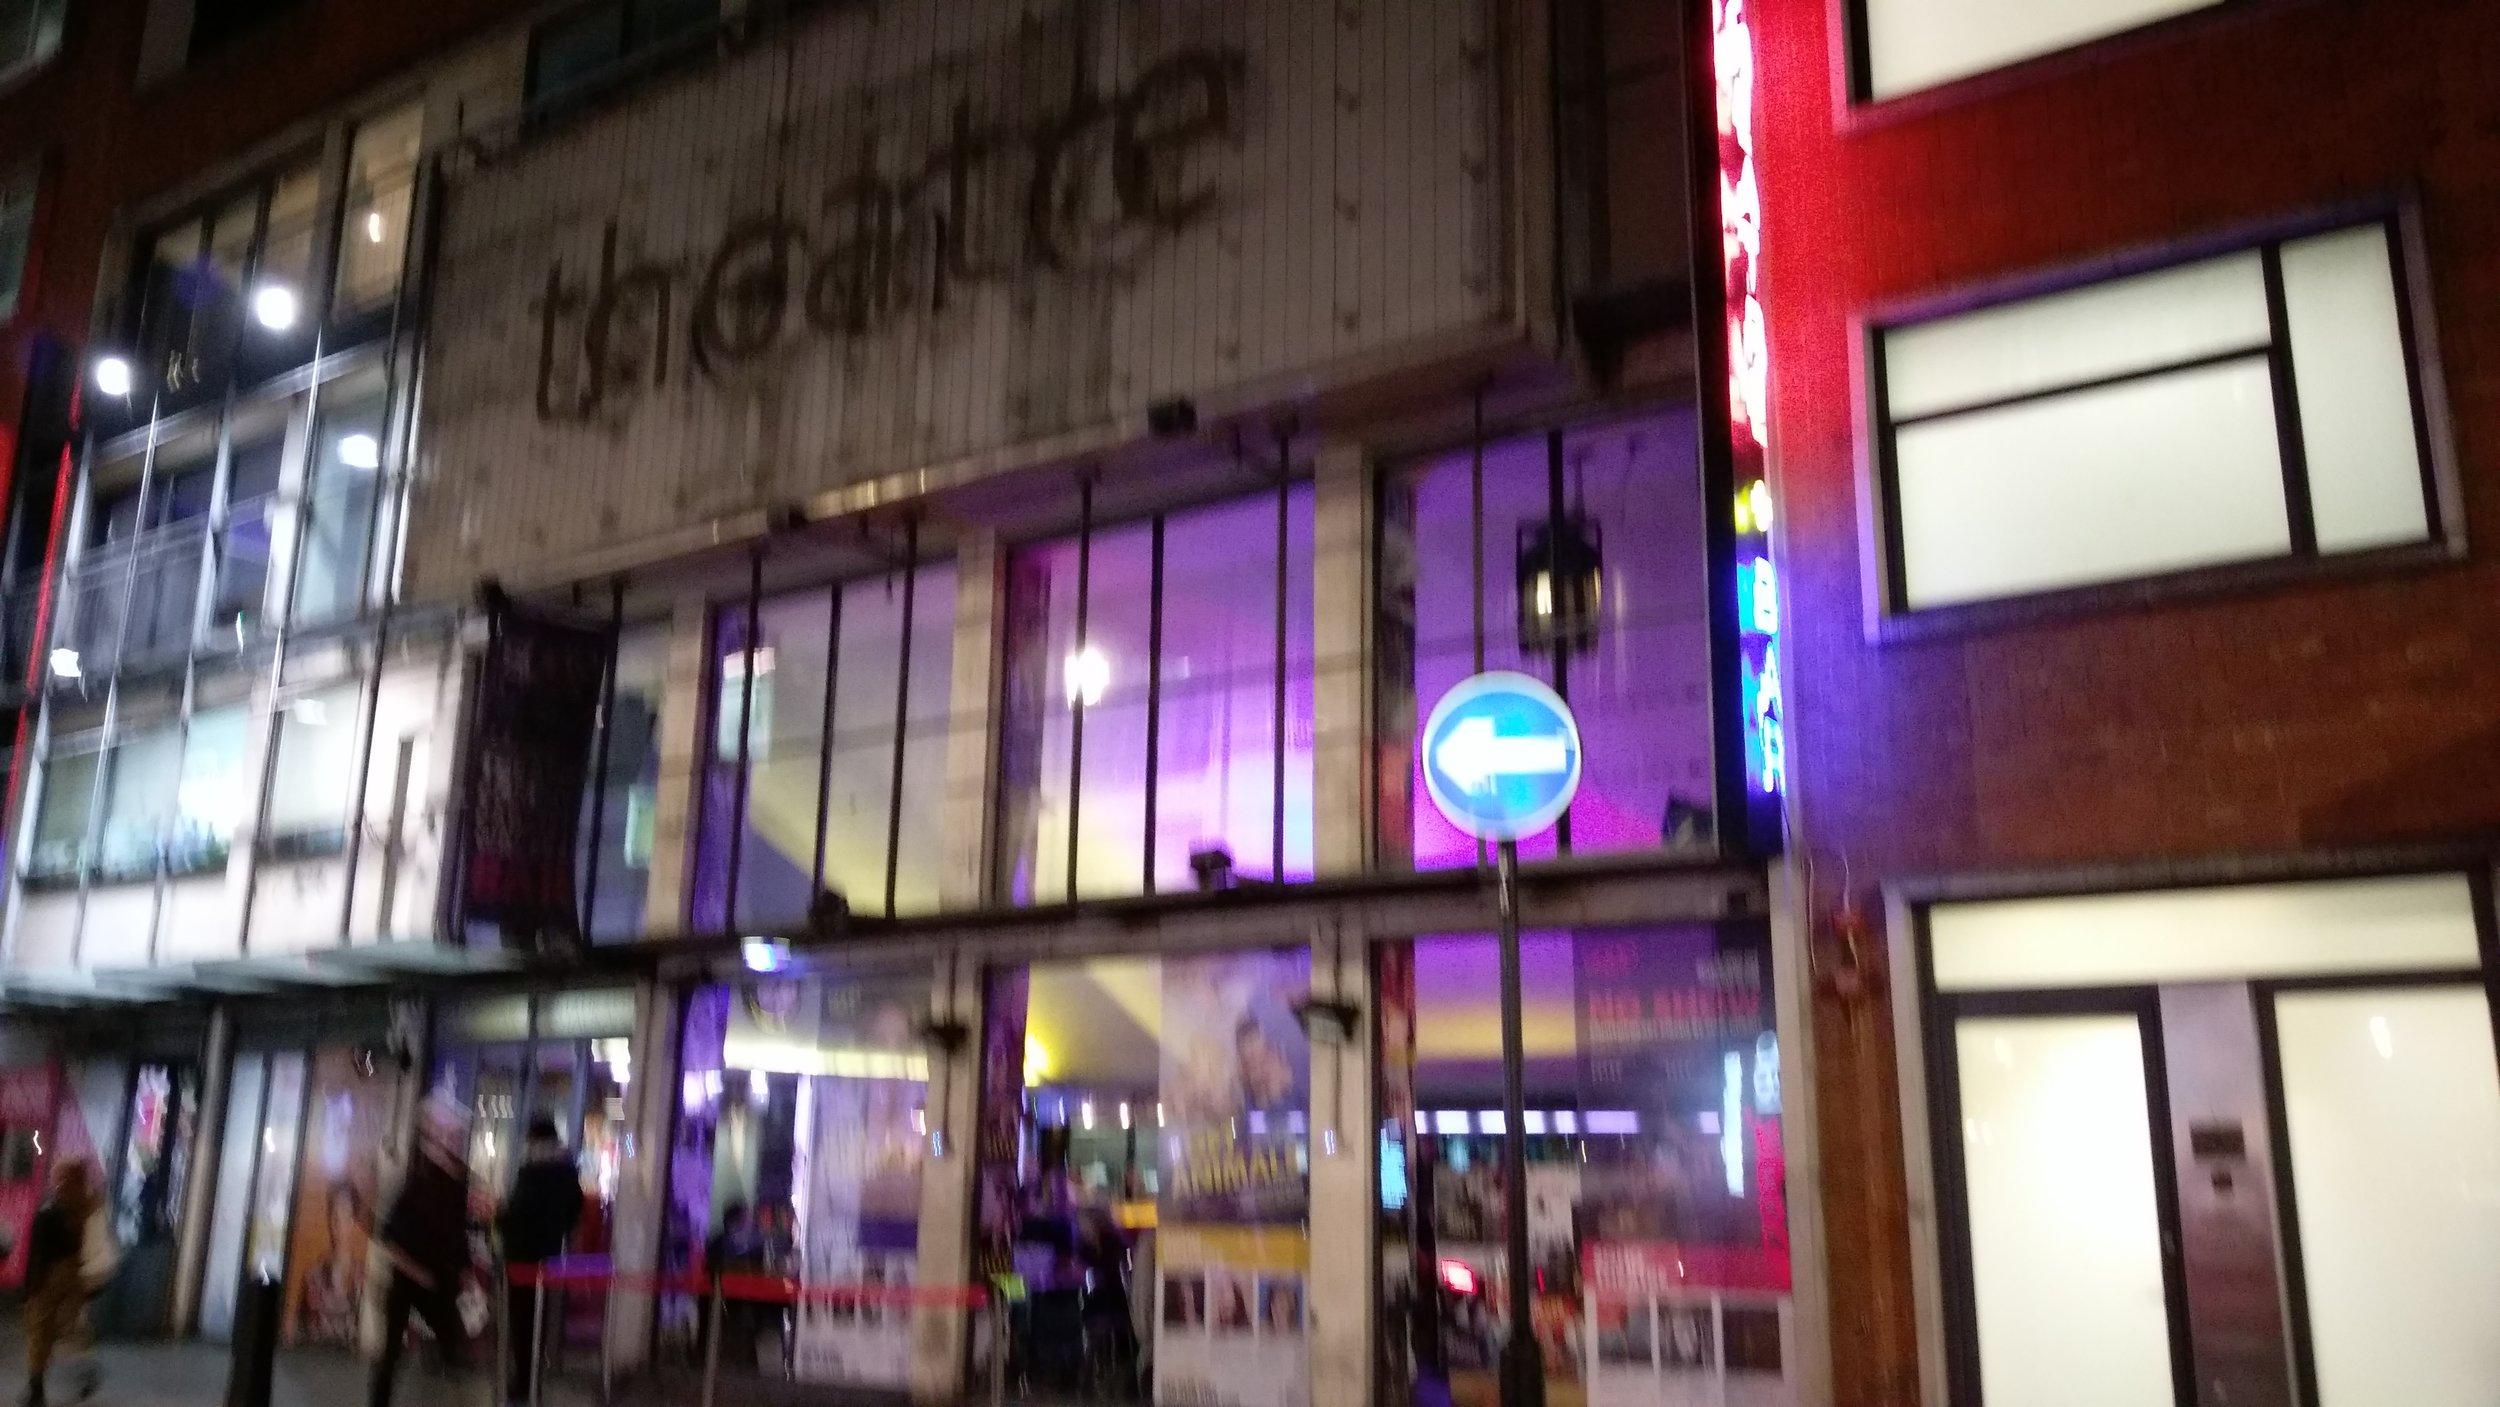 Soho Theatre(Soho Upstairs) - visited 21/01/2019